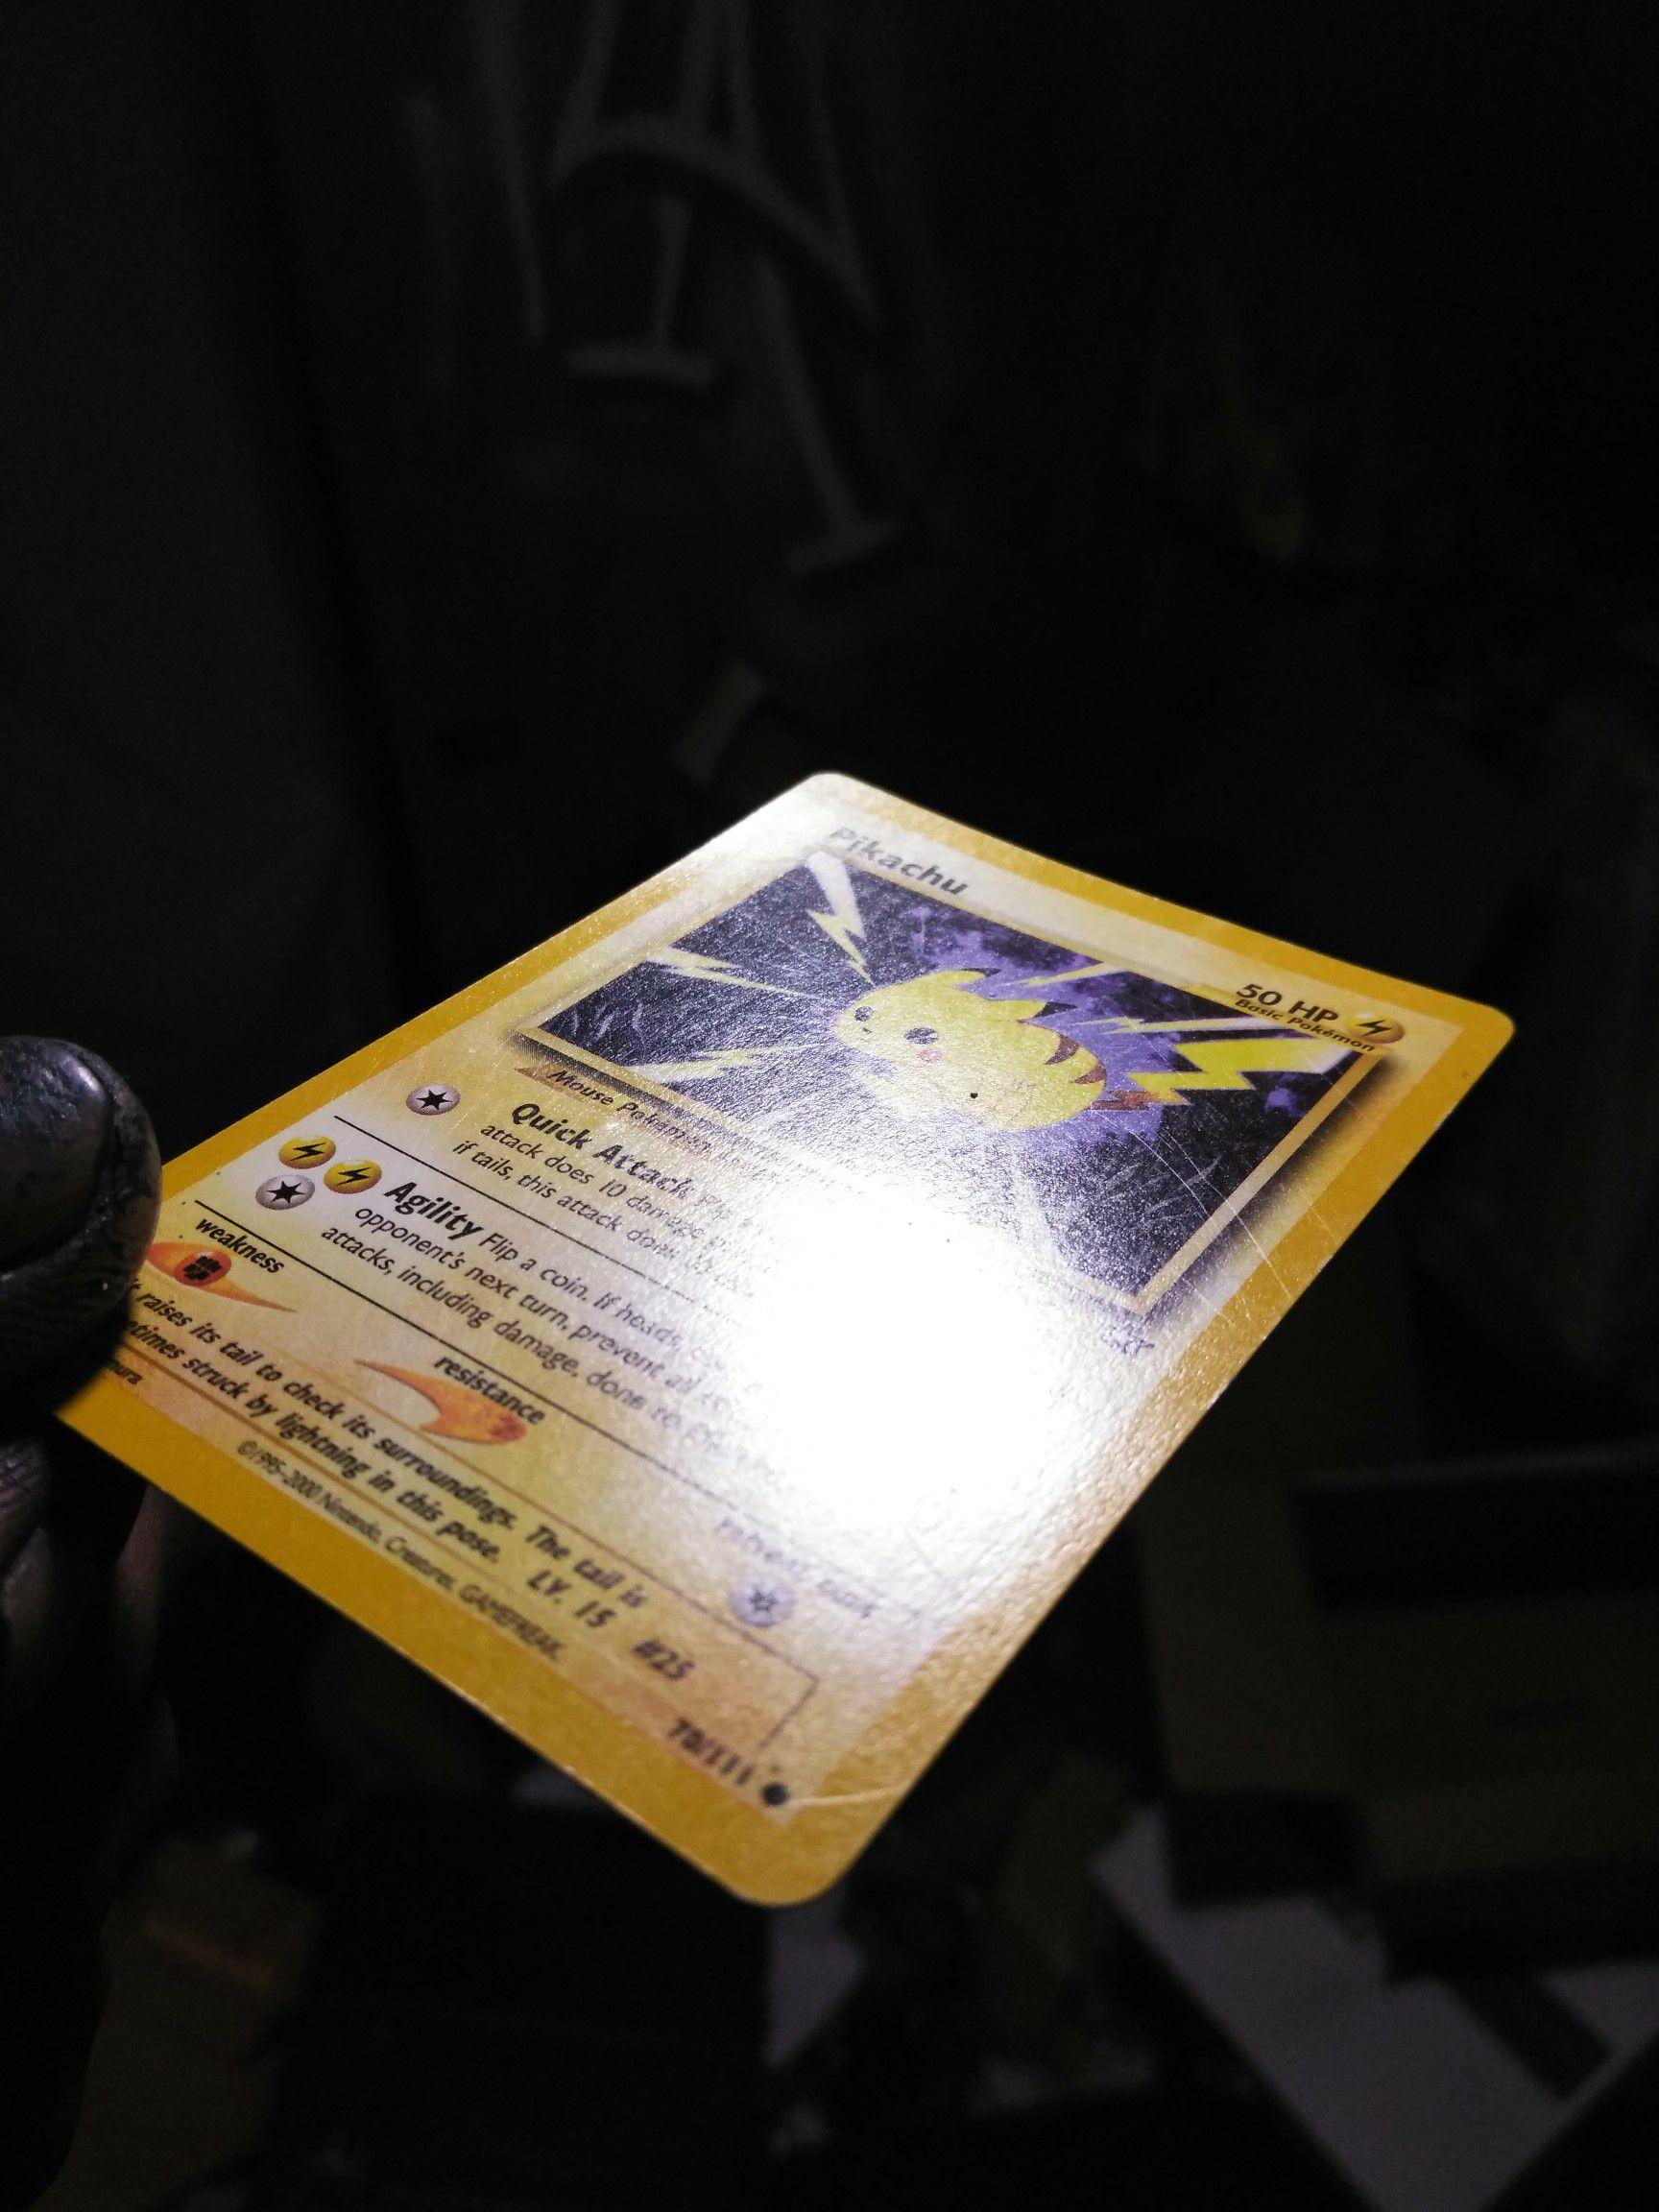 Pikachu pokemon cards